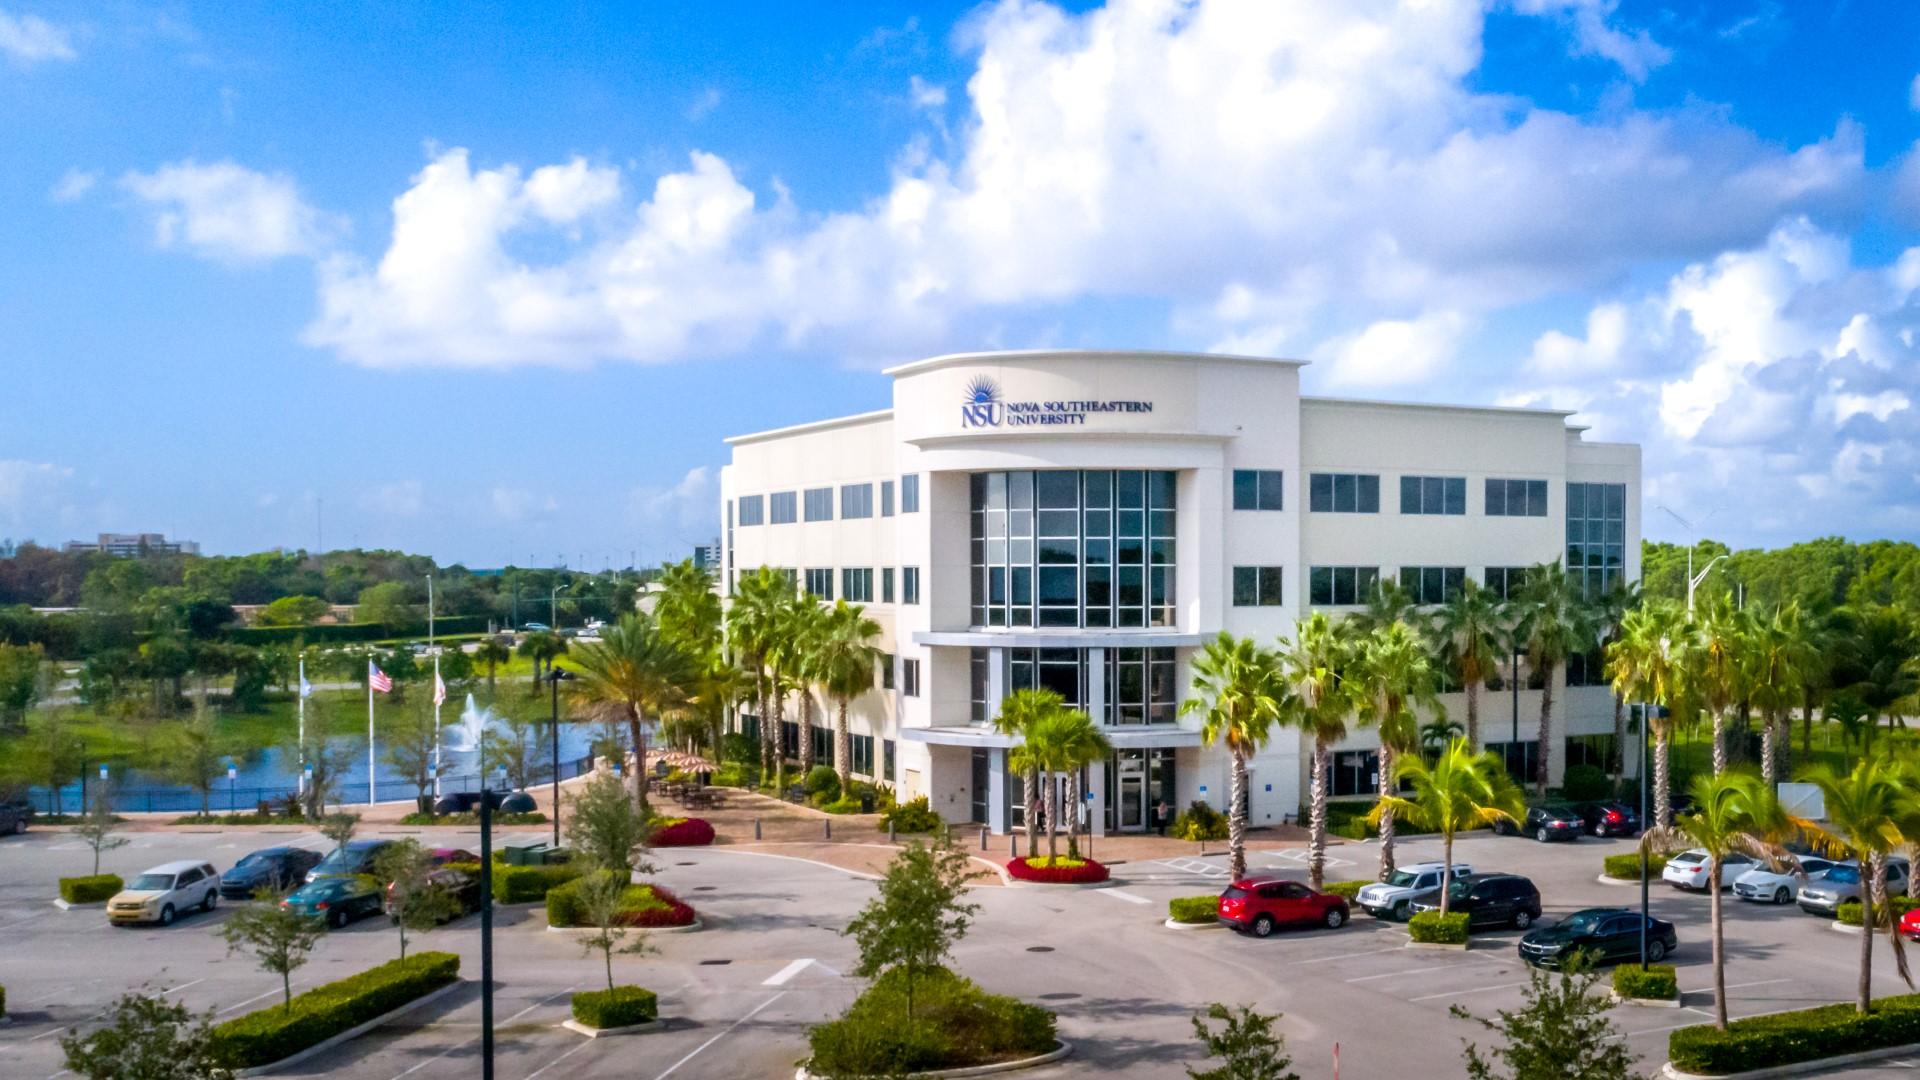 Nova Southeastern University Palm Beach Gardens